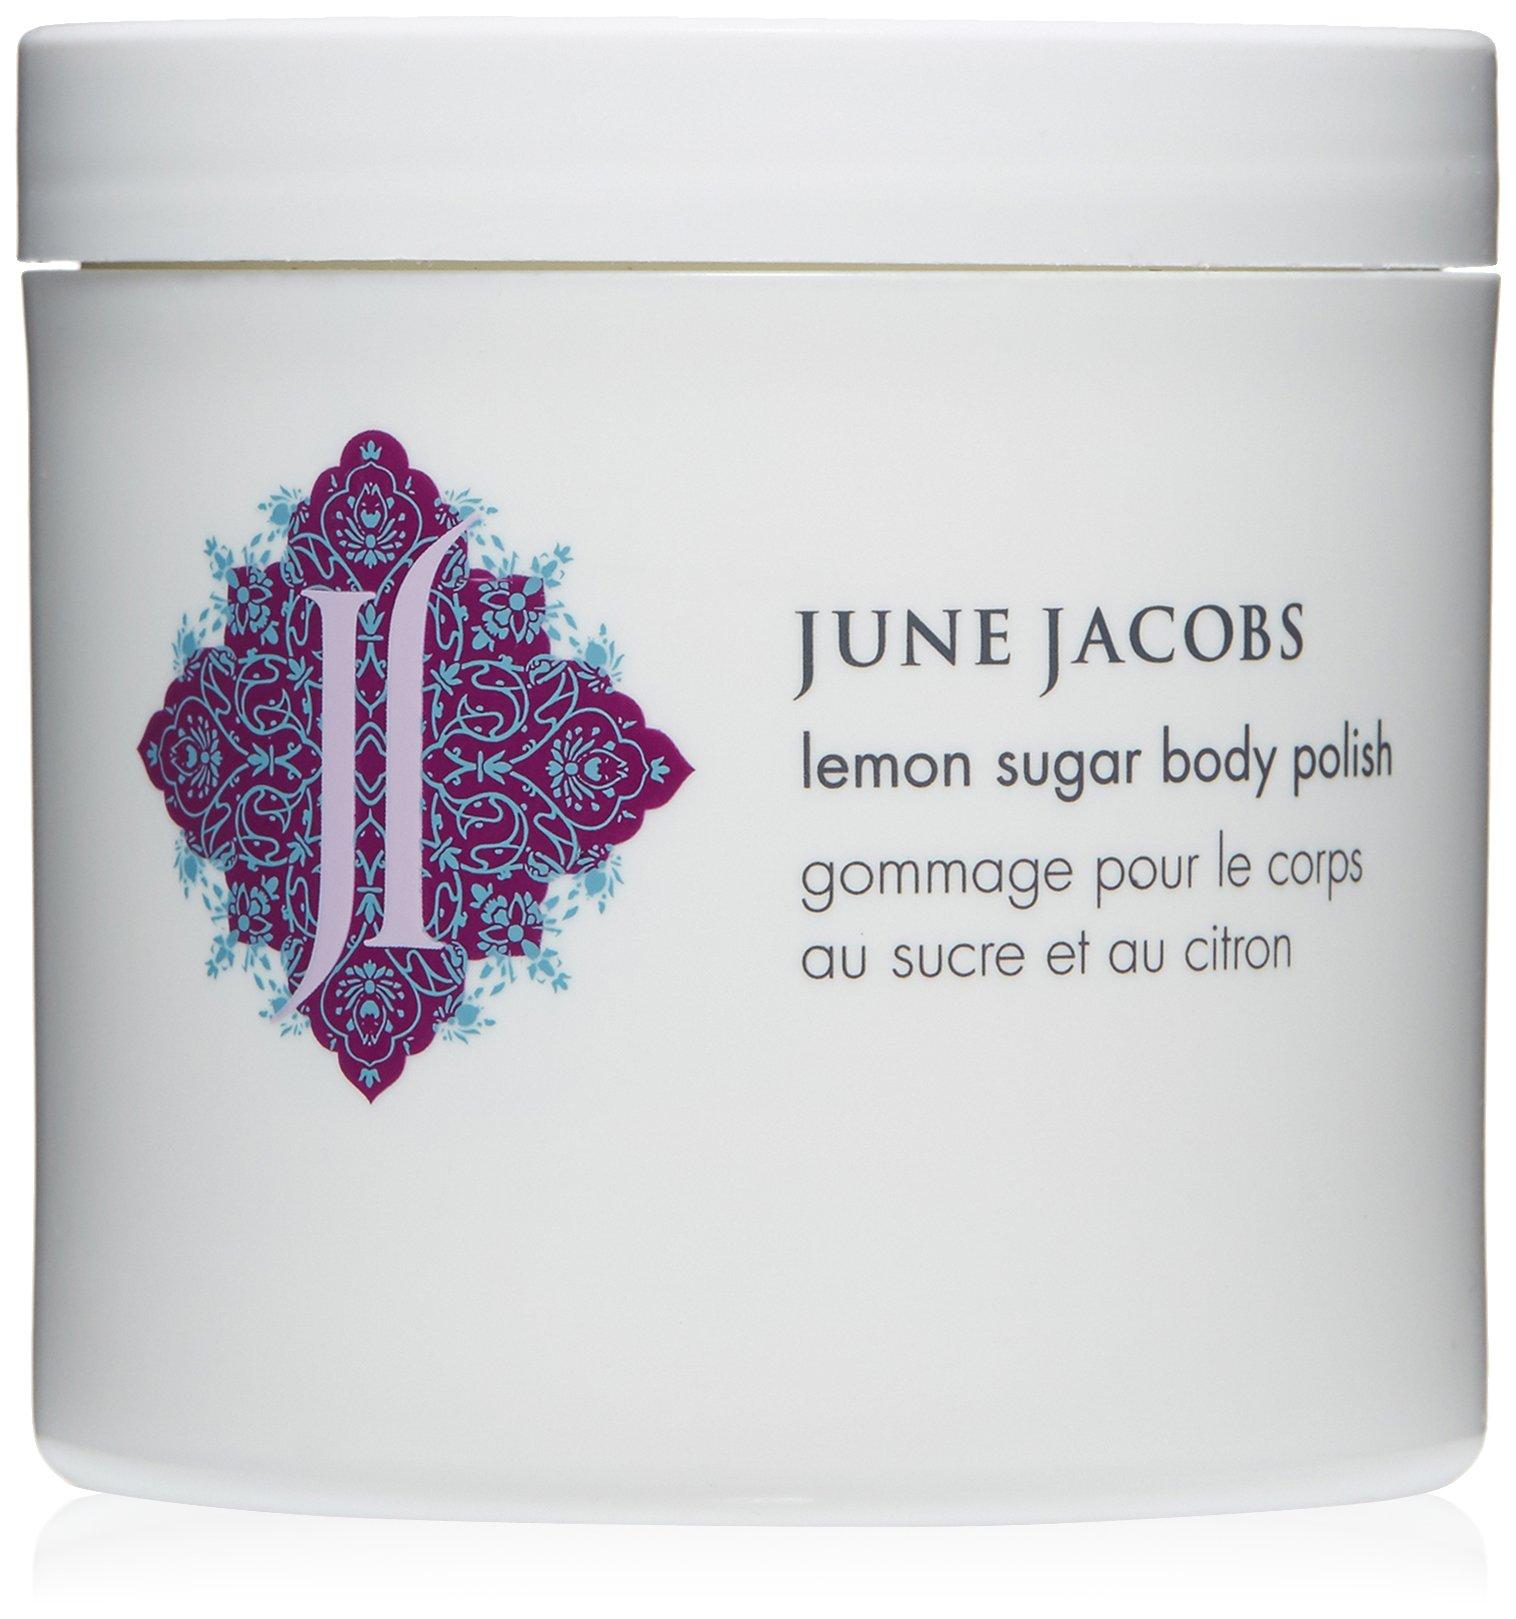 June Jacobs Lemon Sugar Body Polish, 6 Fl Oz